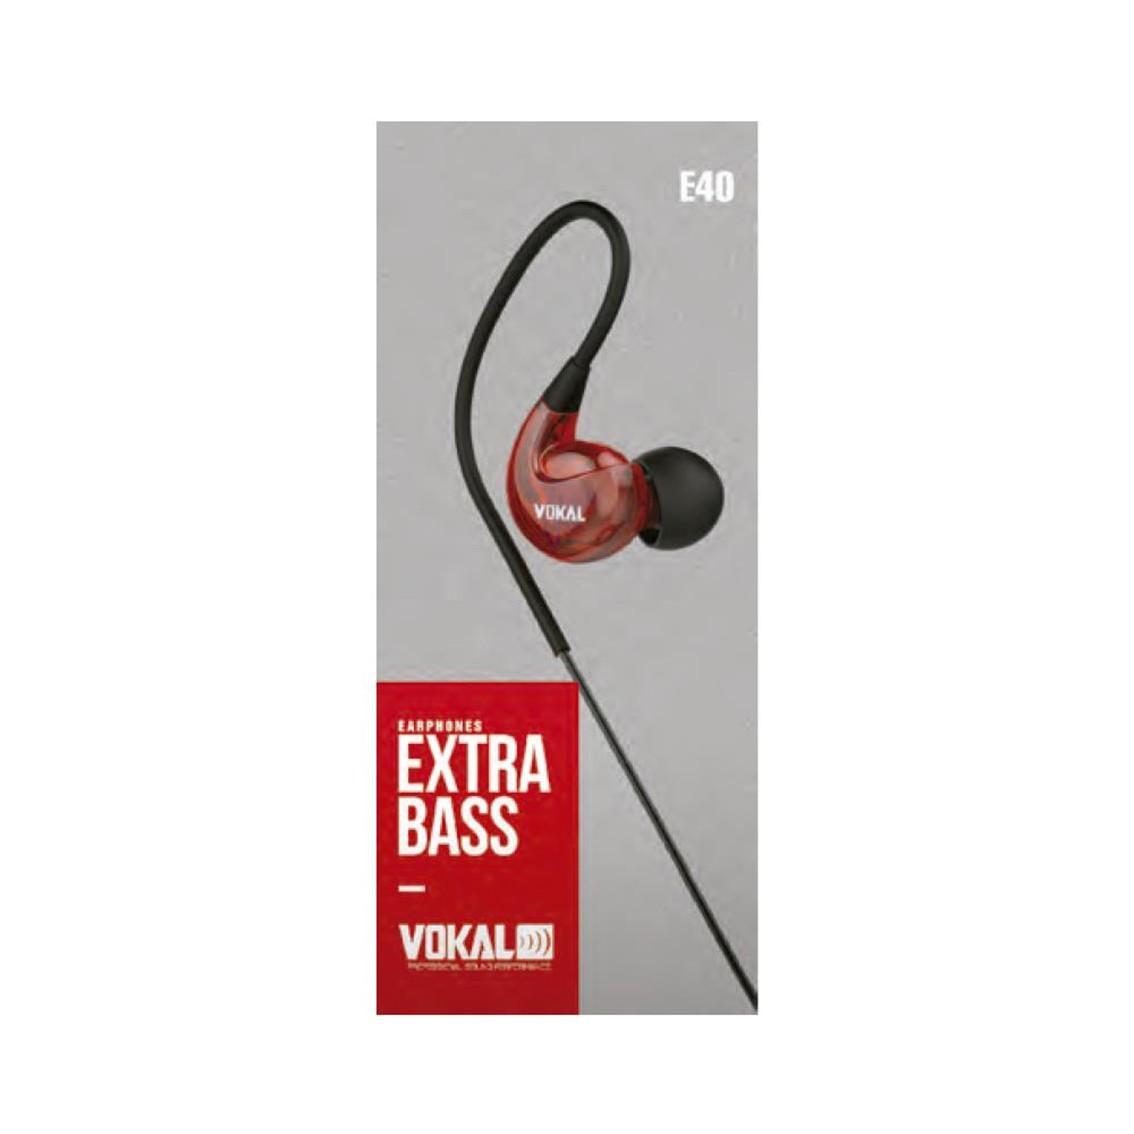 Foto2 - Fone Monitor In Ear Vokal E40 Extra Bass